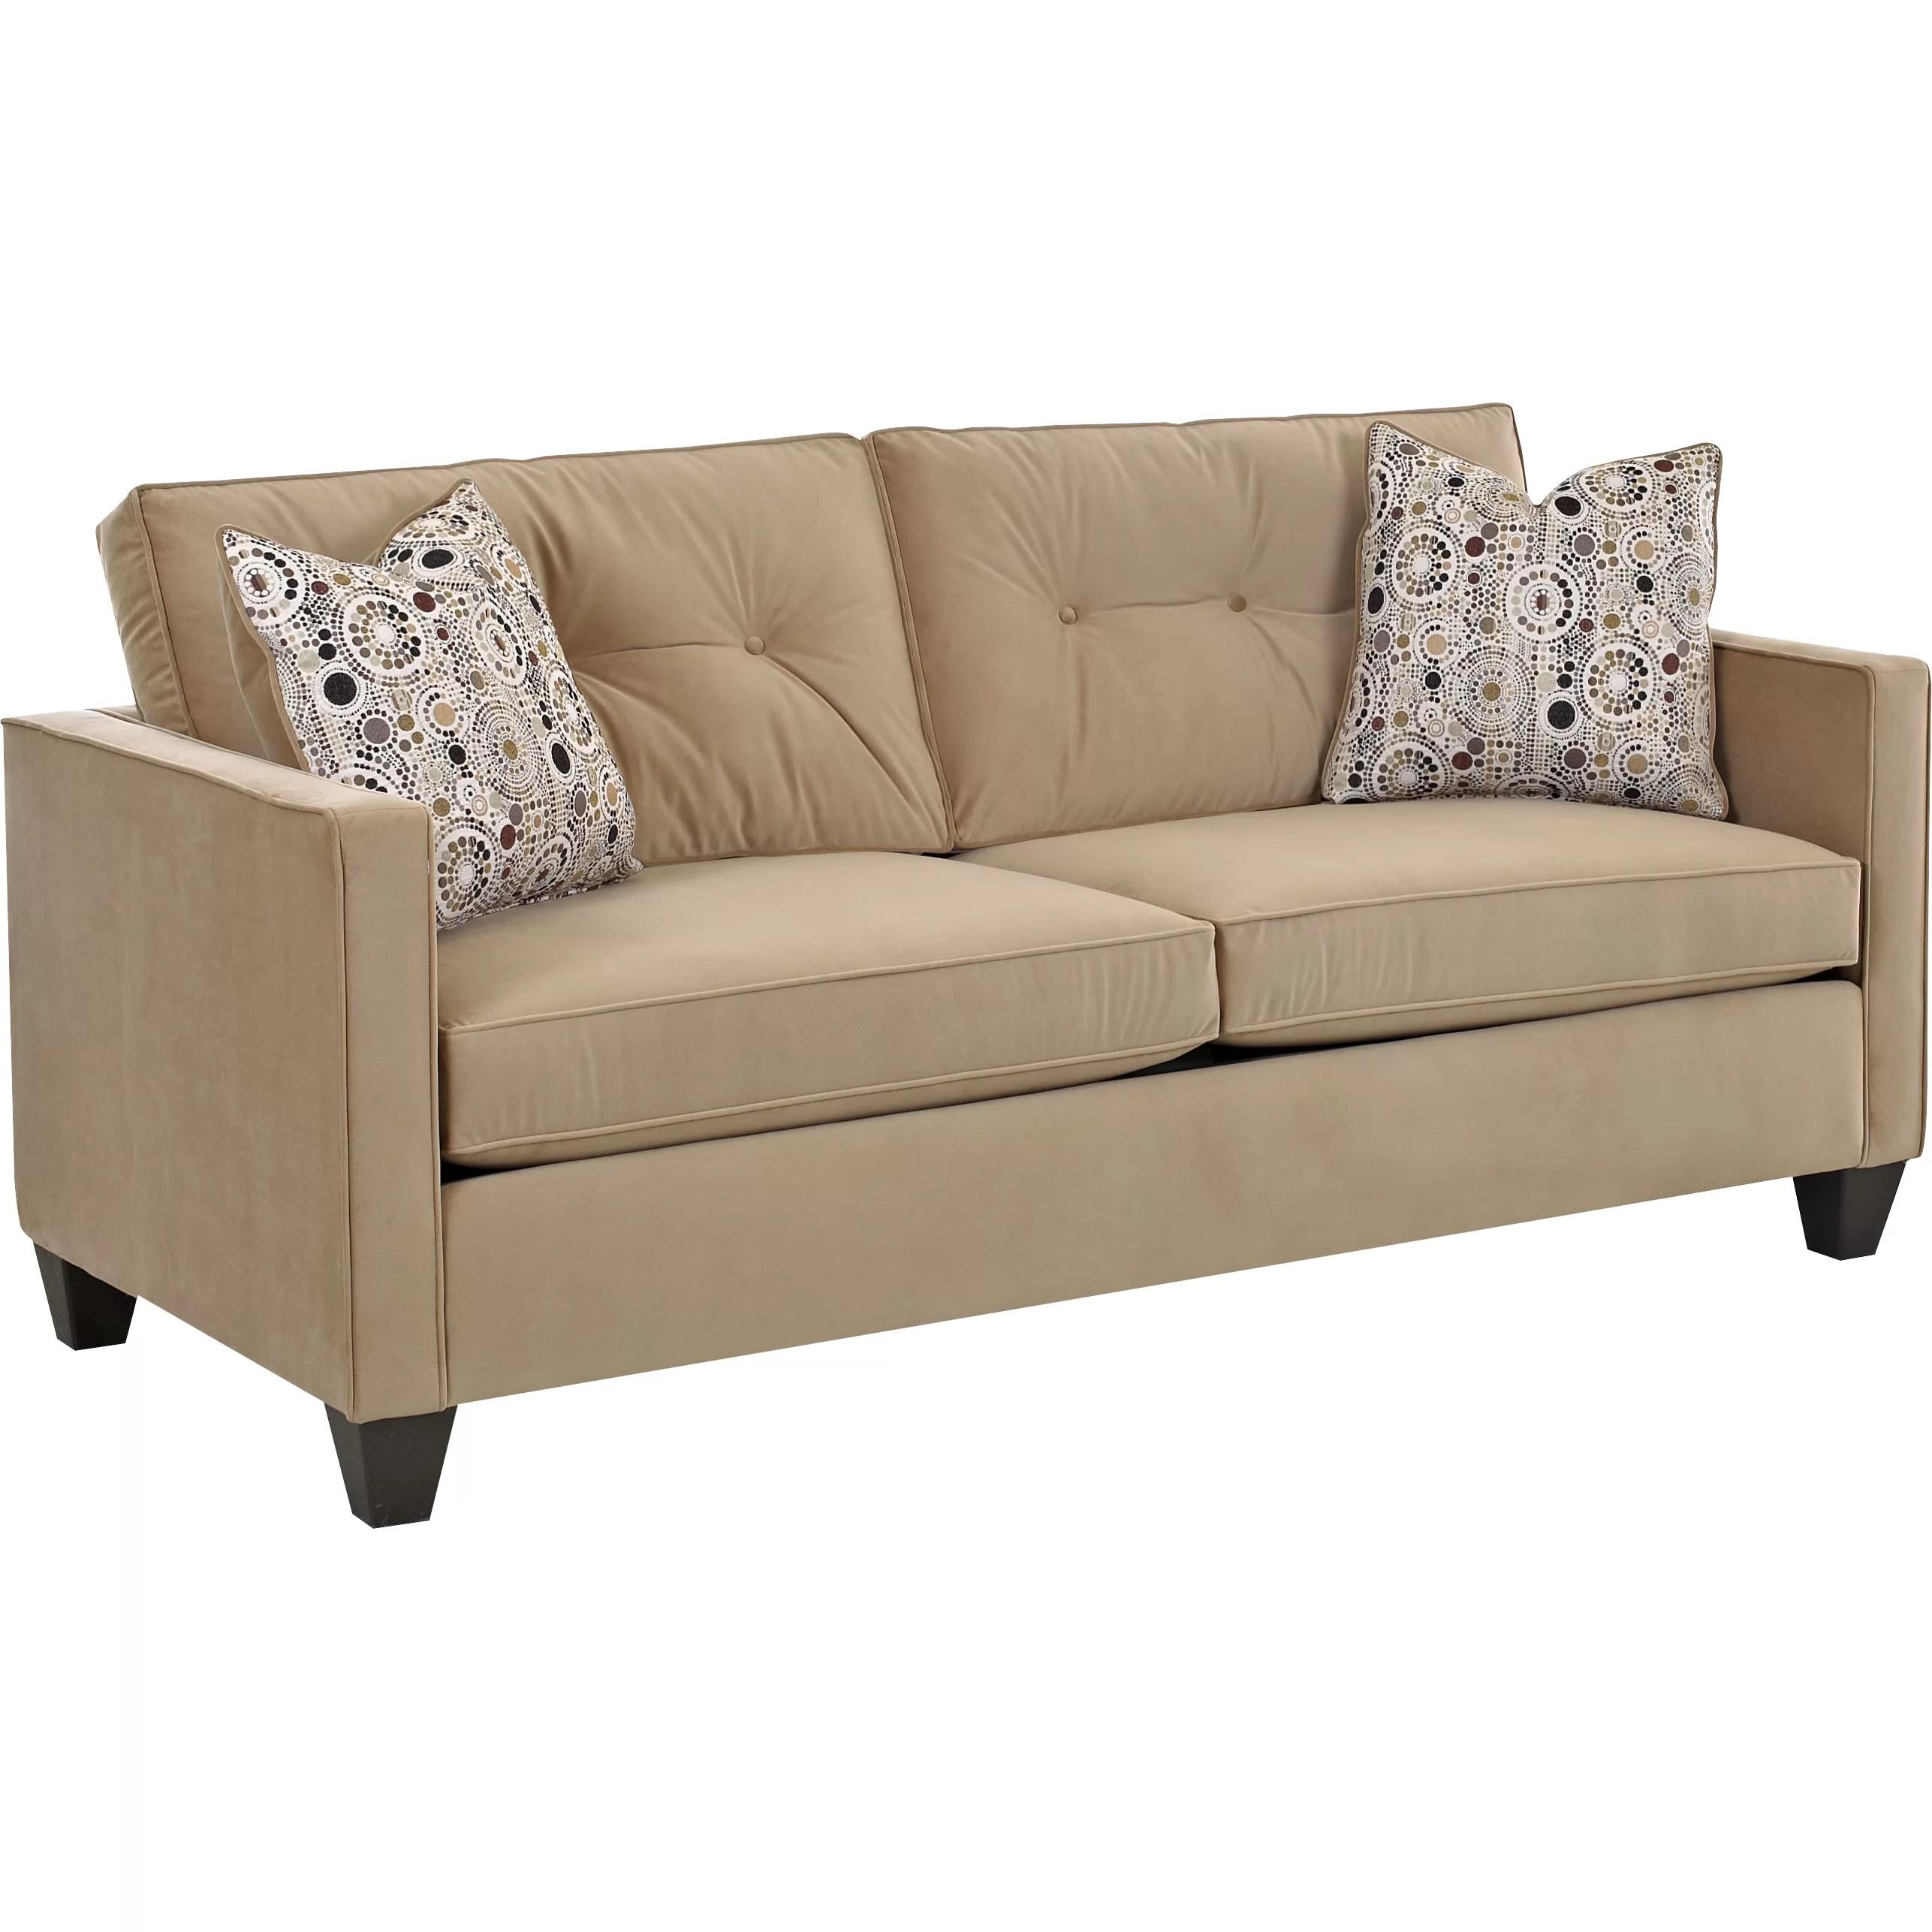 Klaussner Furniture Derry Sofa Reviews Wayfair